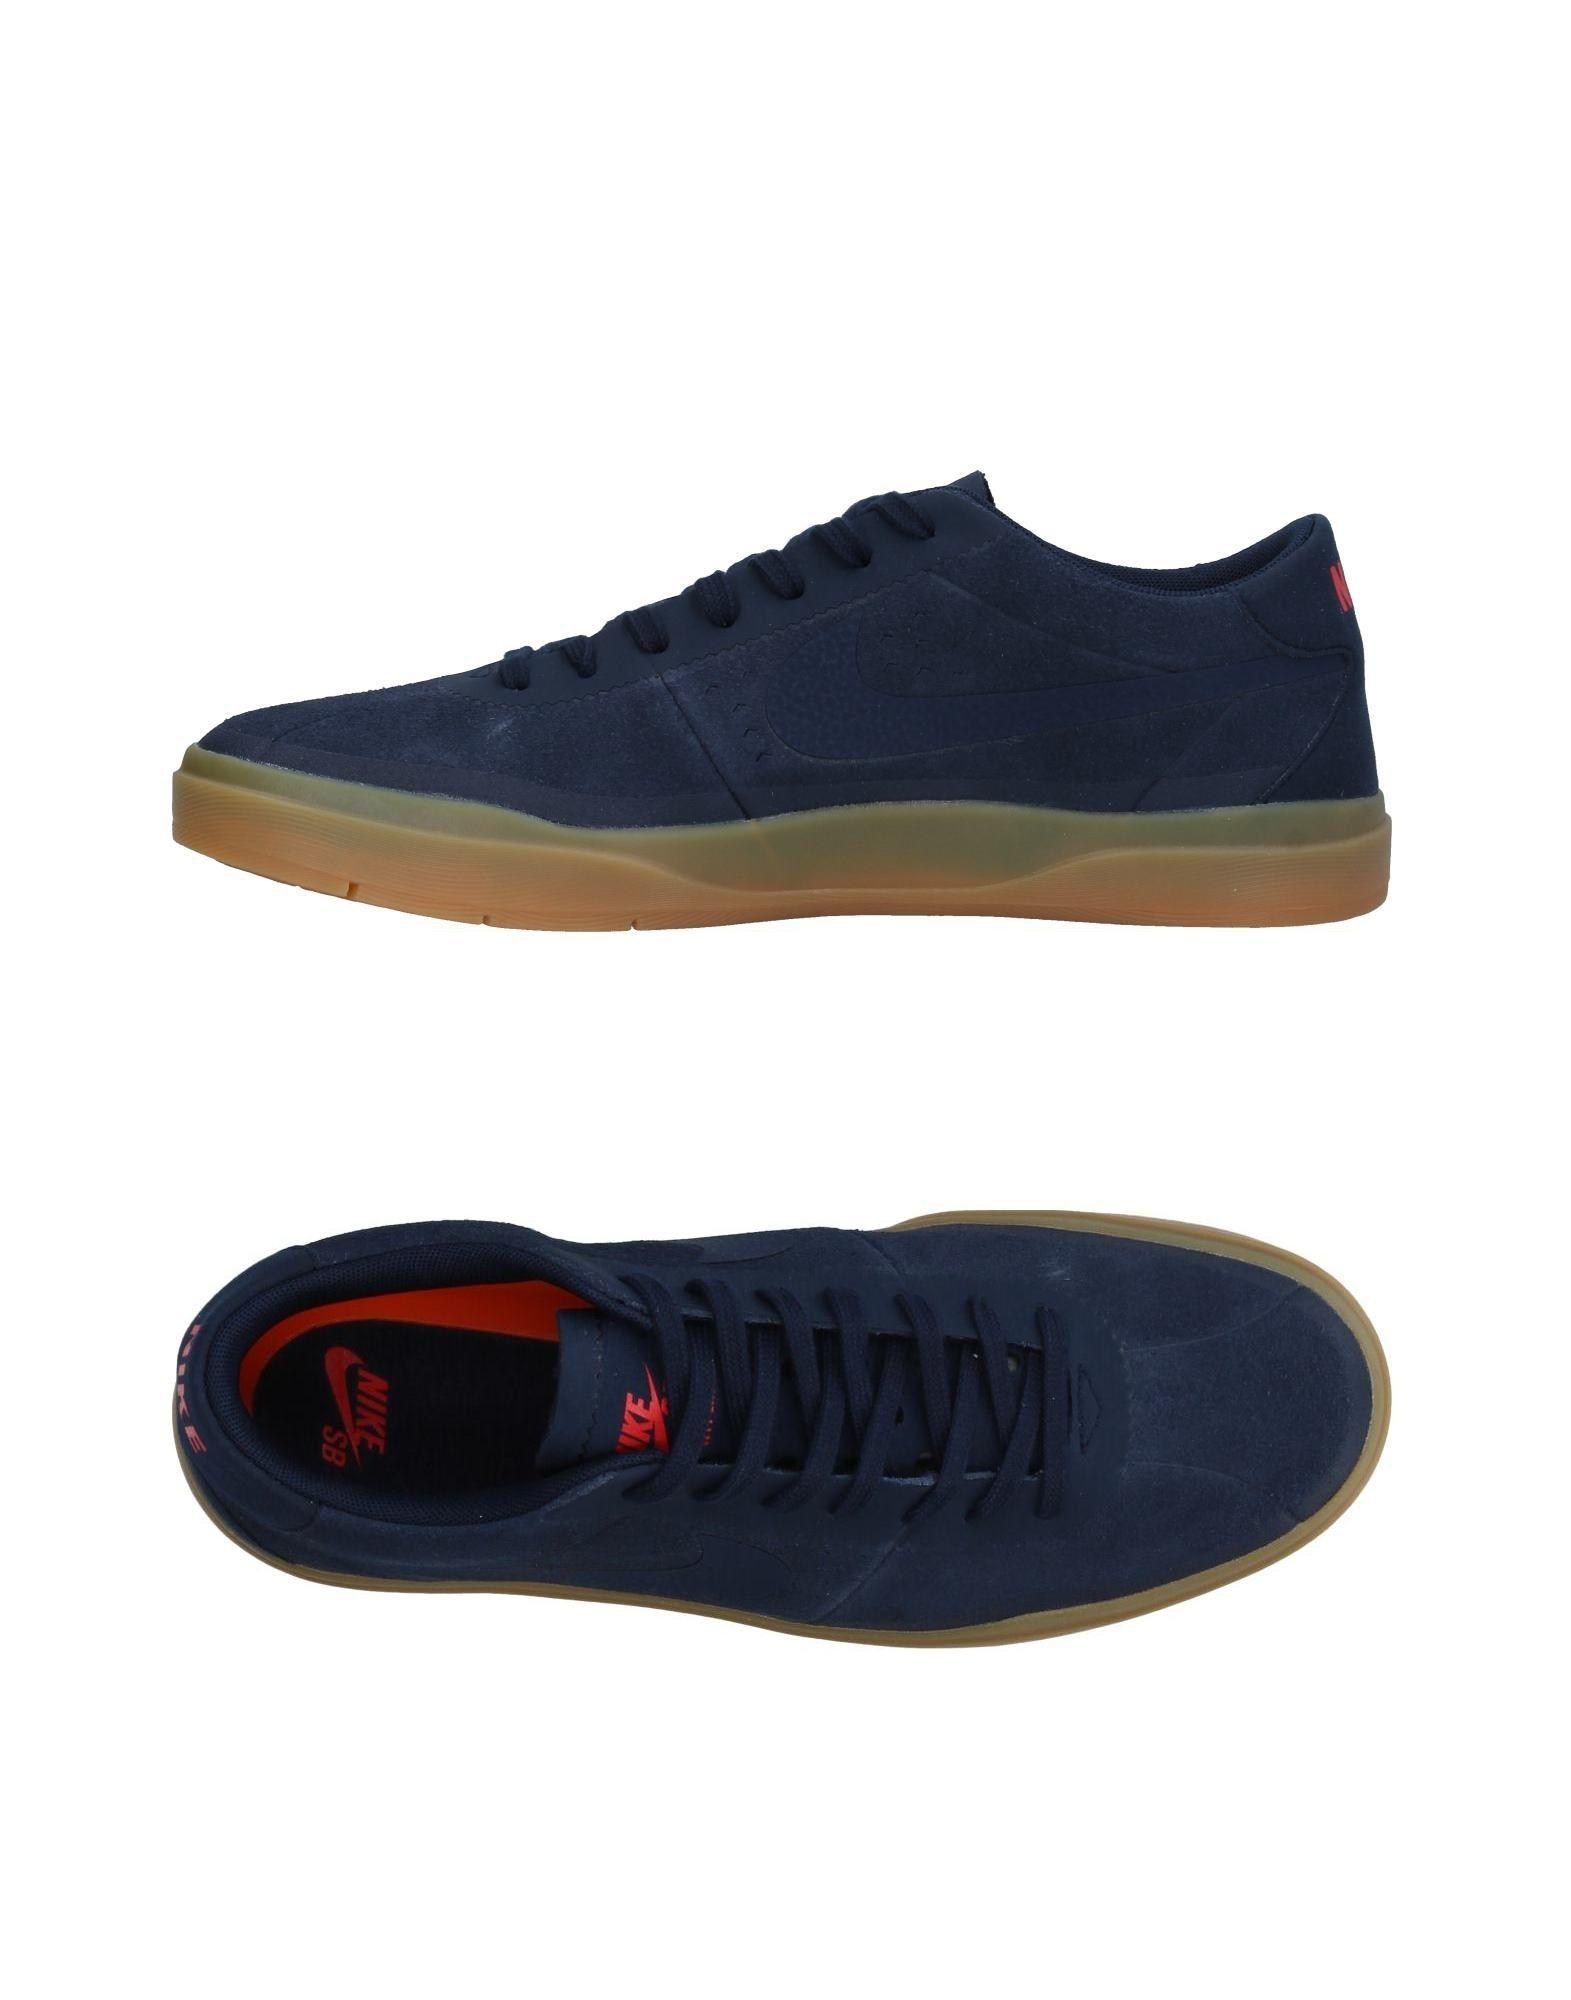 A buon mercato Sneakers Nike Uomo - 11336740AH